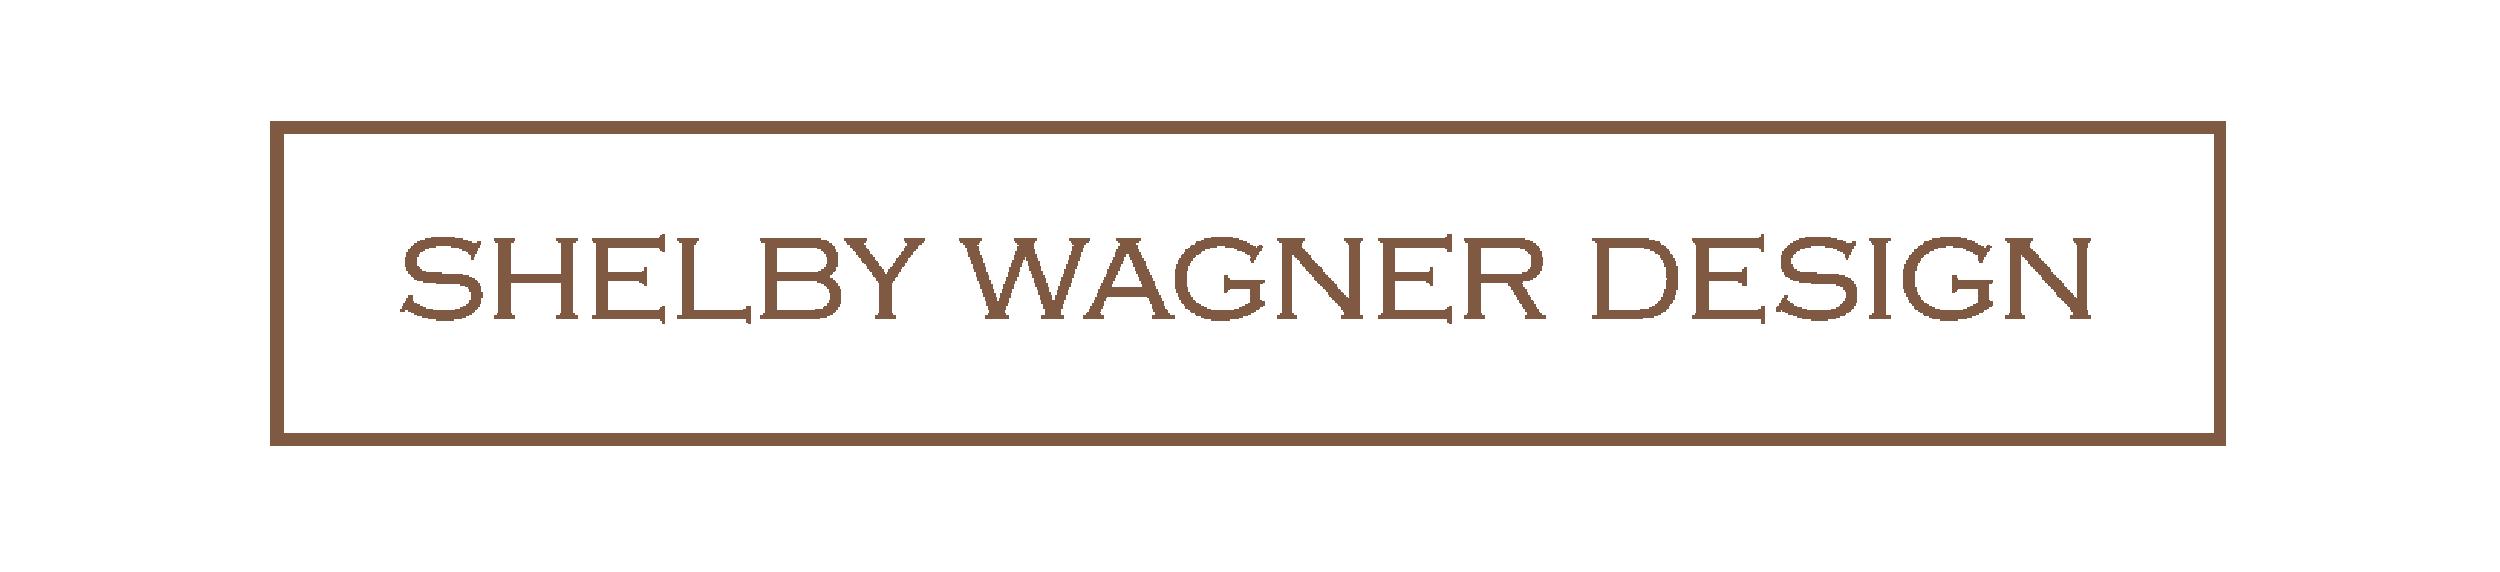 Shelby Wagner Design